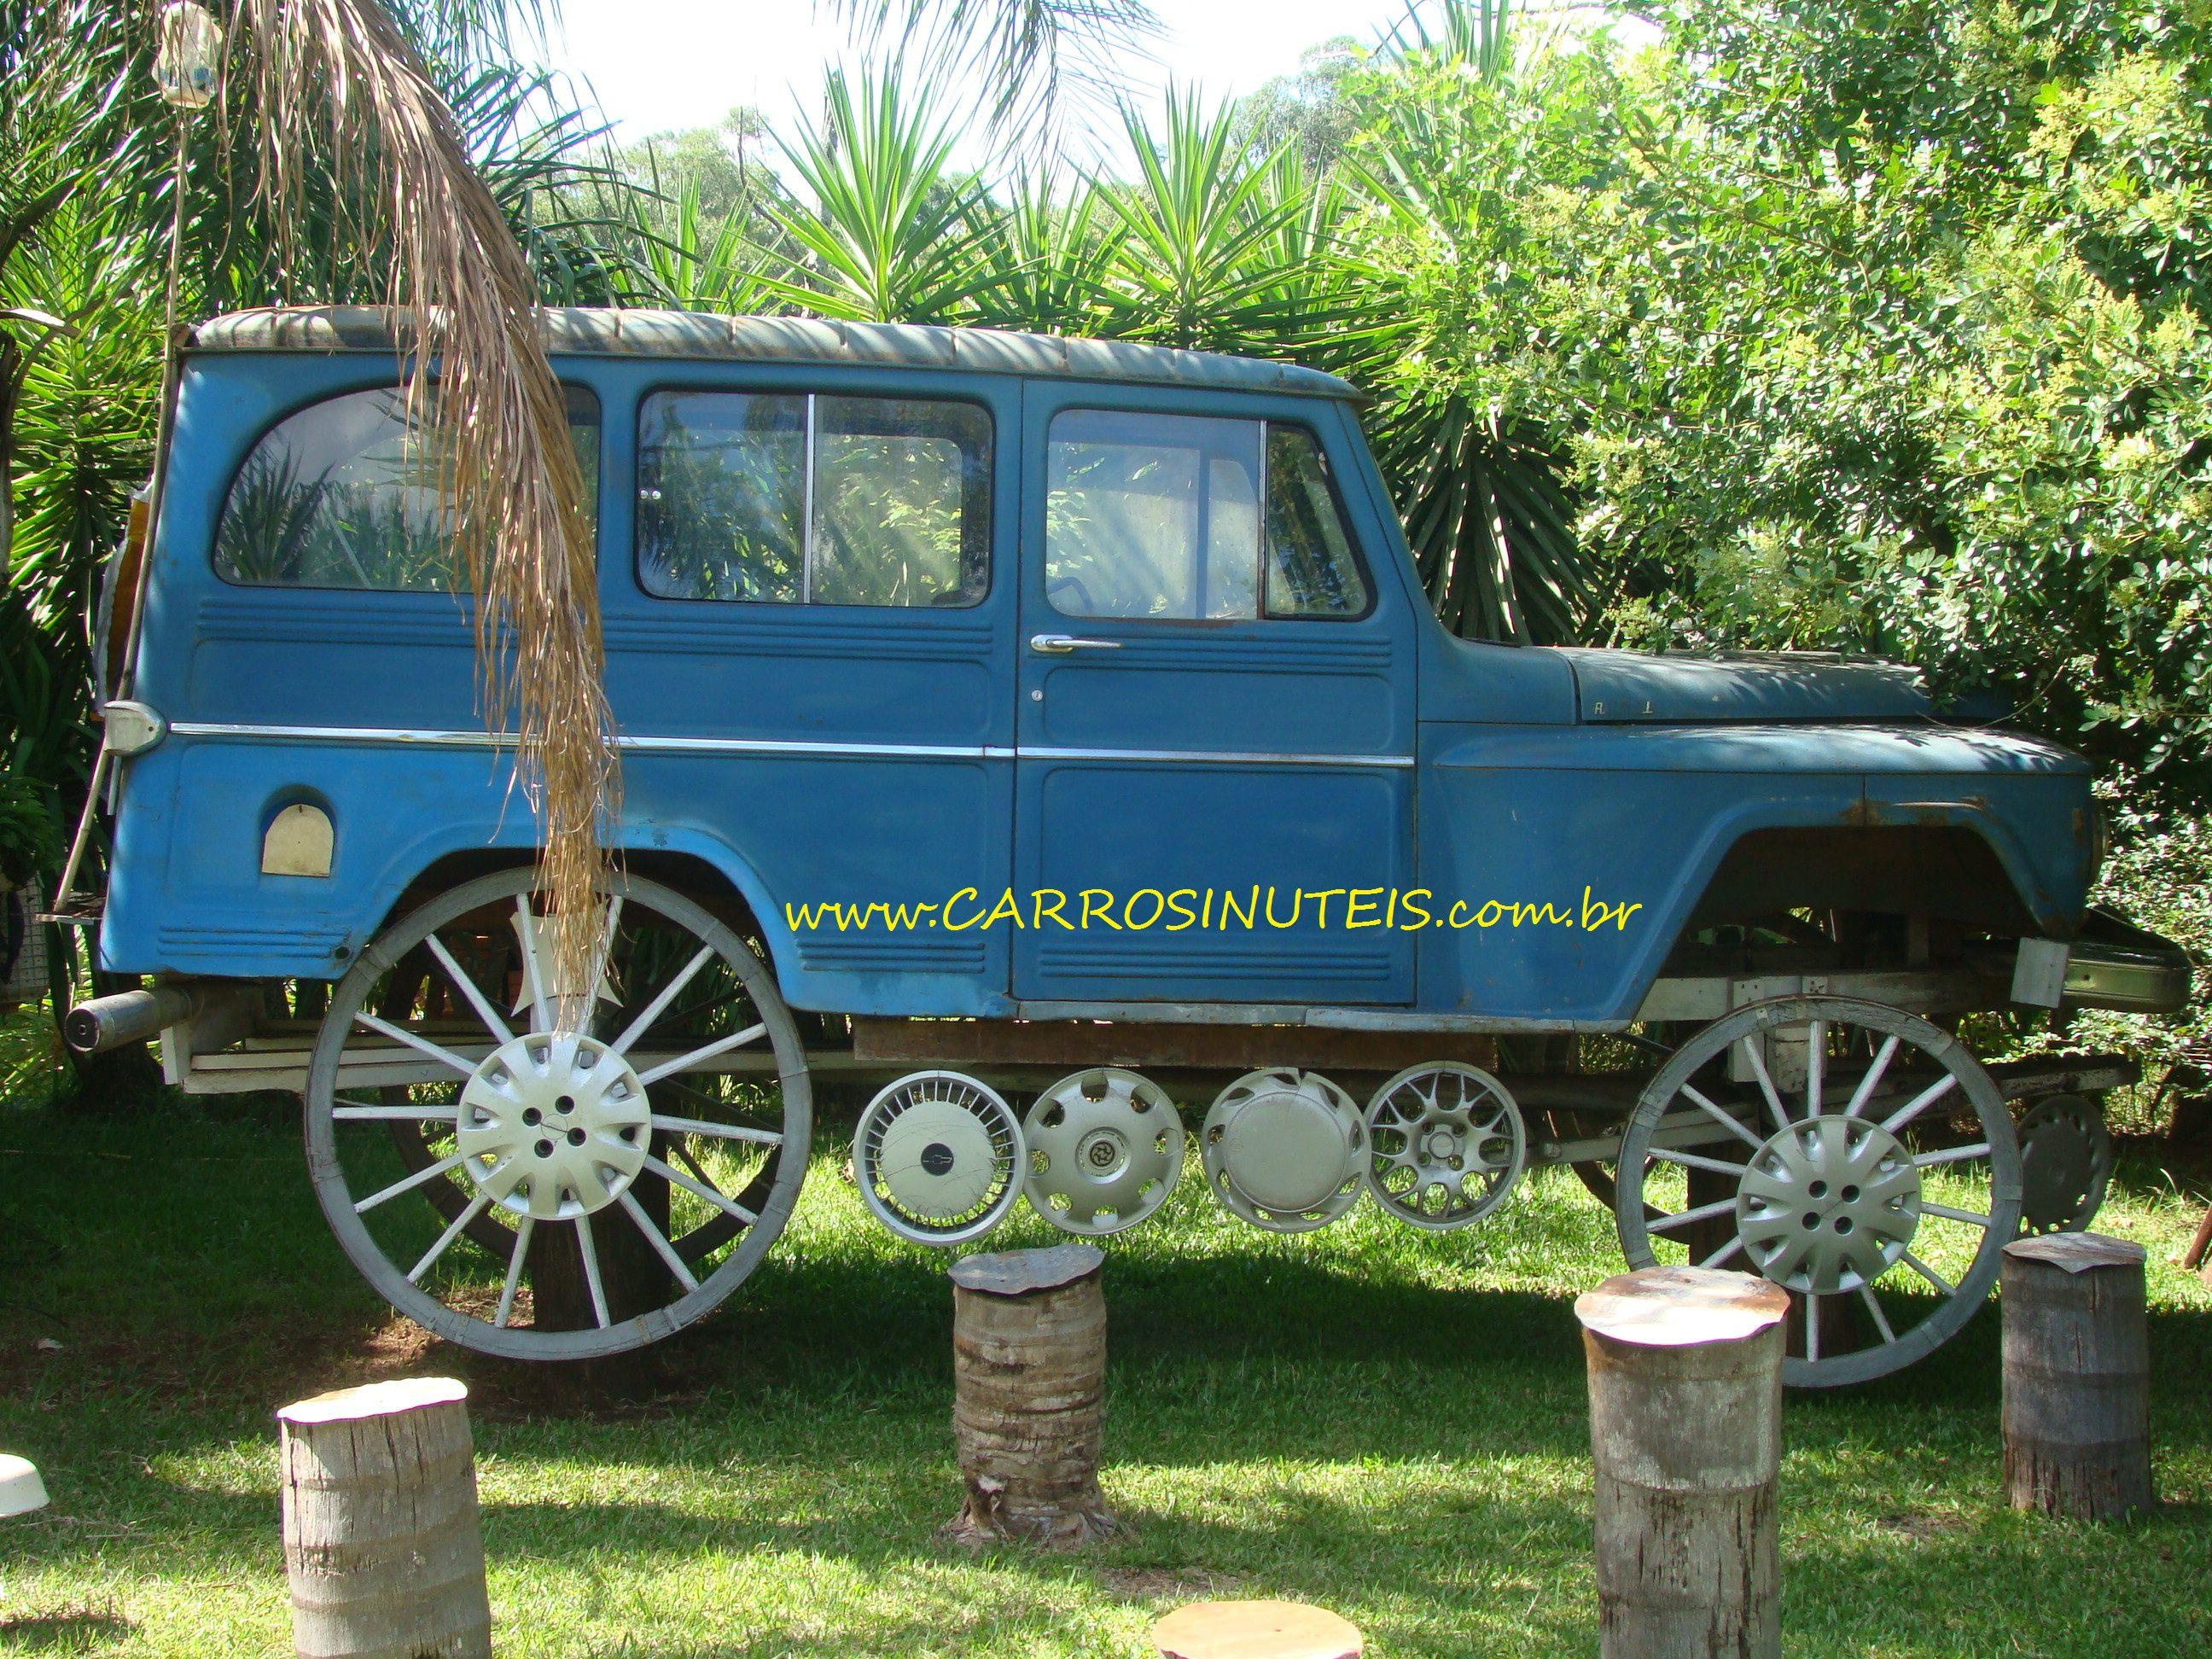 AdrianoPinheiro-Rural-Chapada-RS-adrio Rural Willys, Chapada, RS. Foto de Adrio.